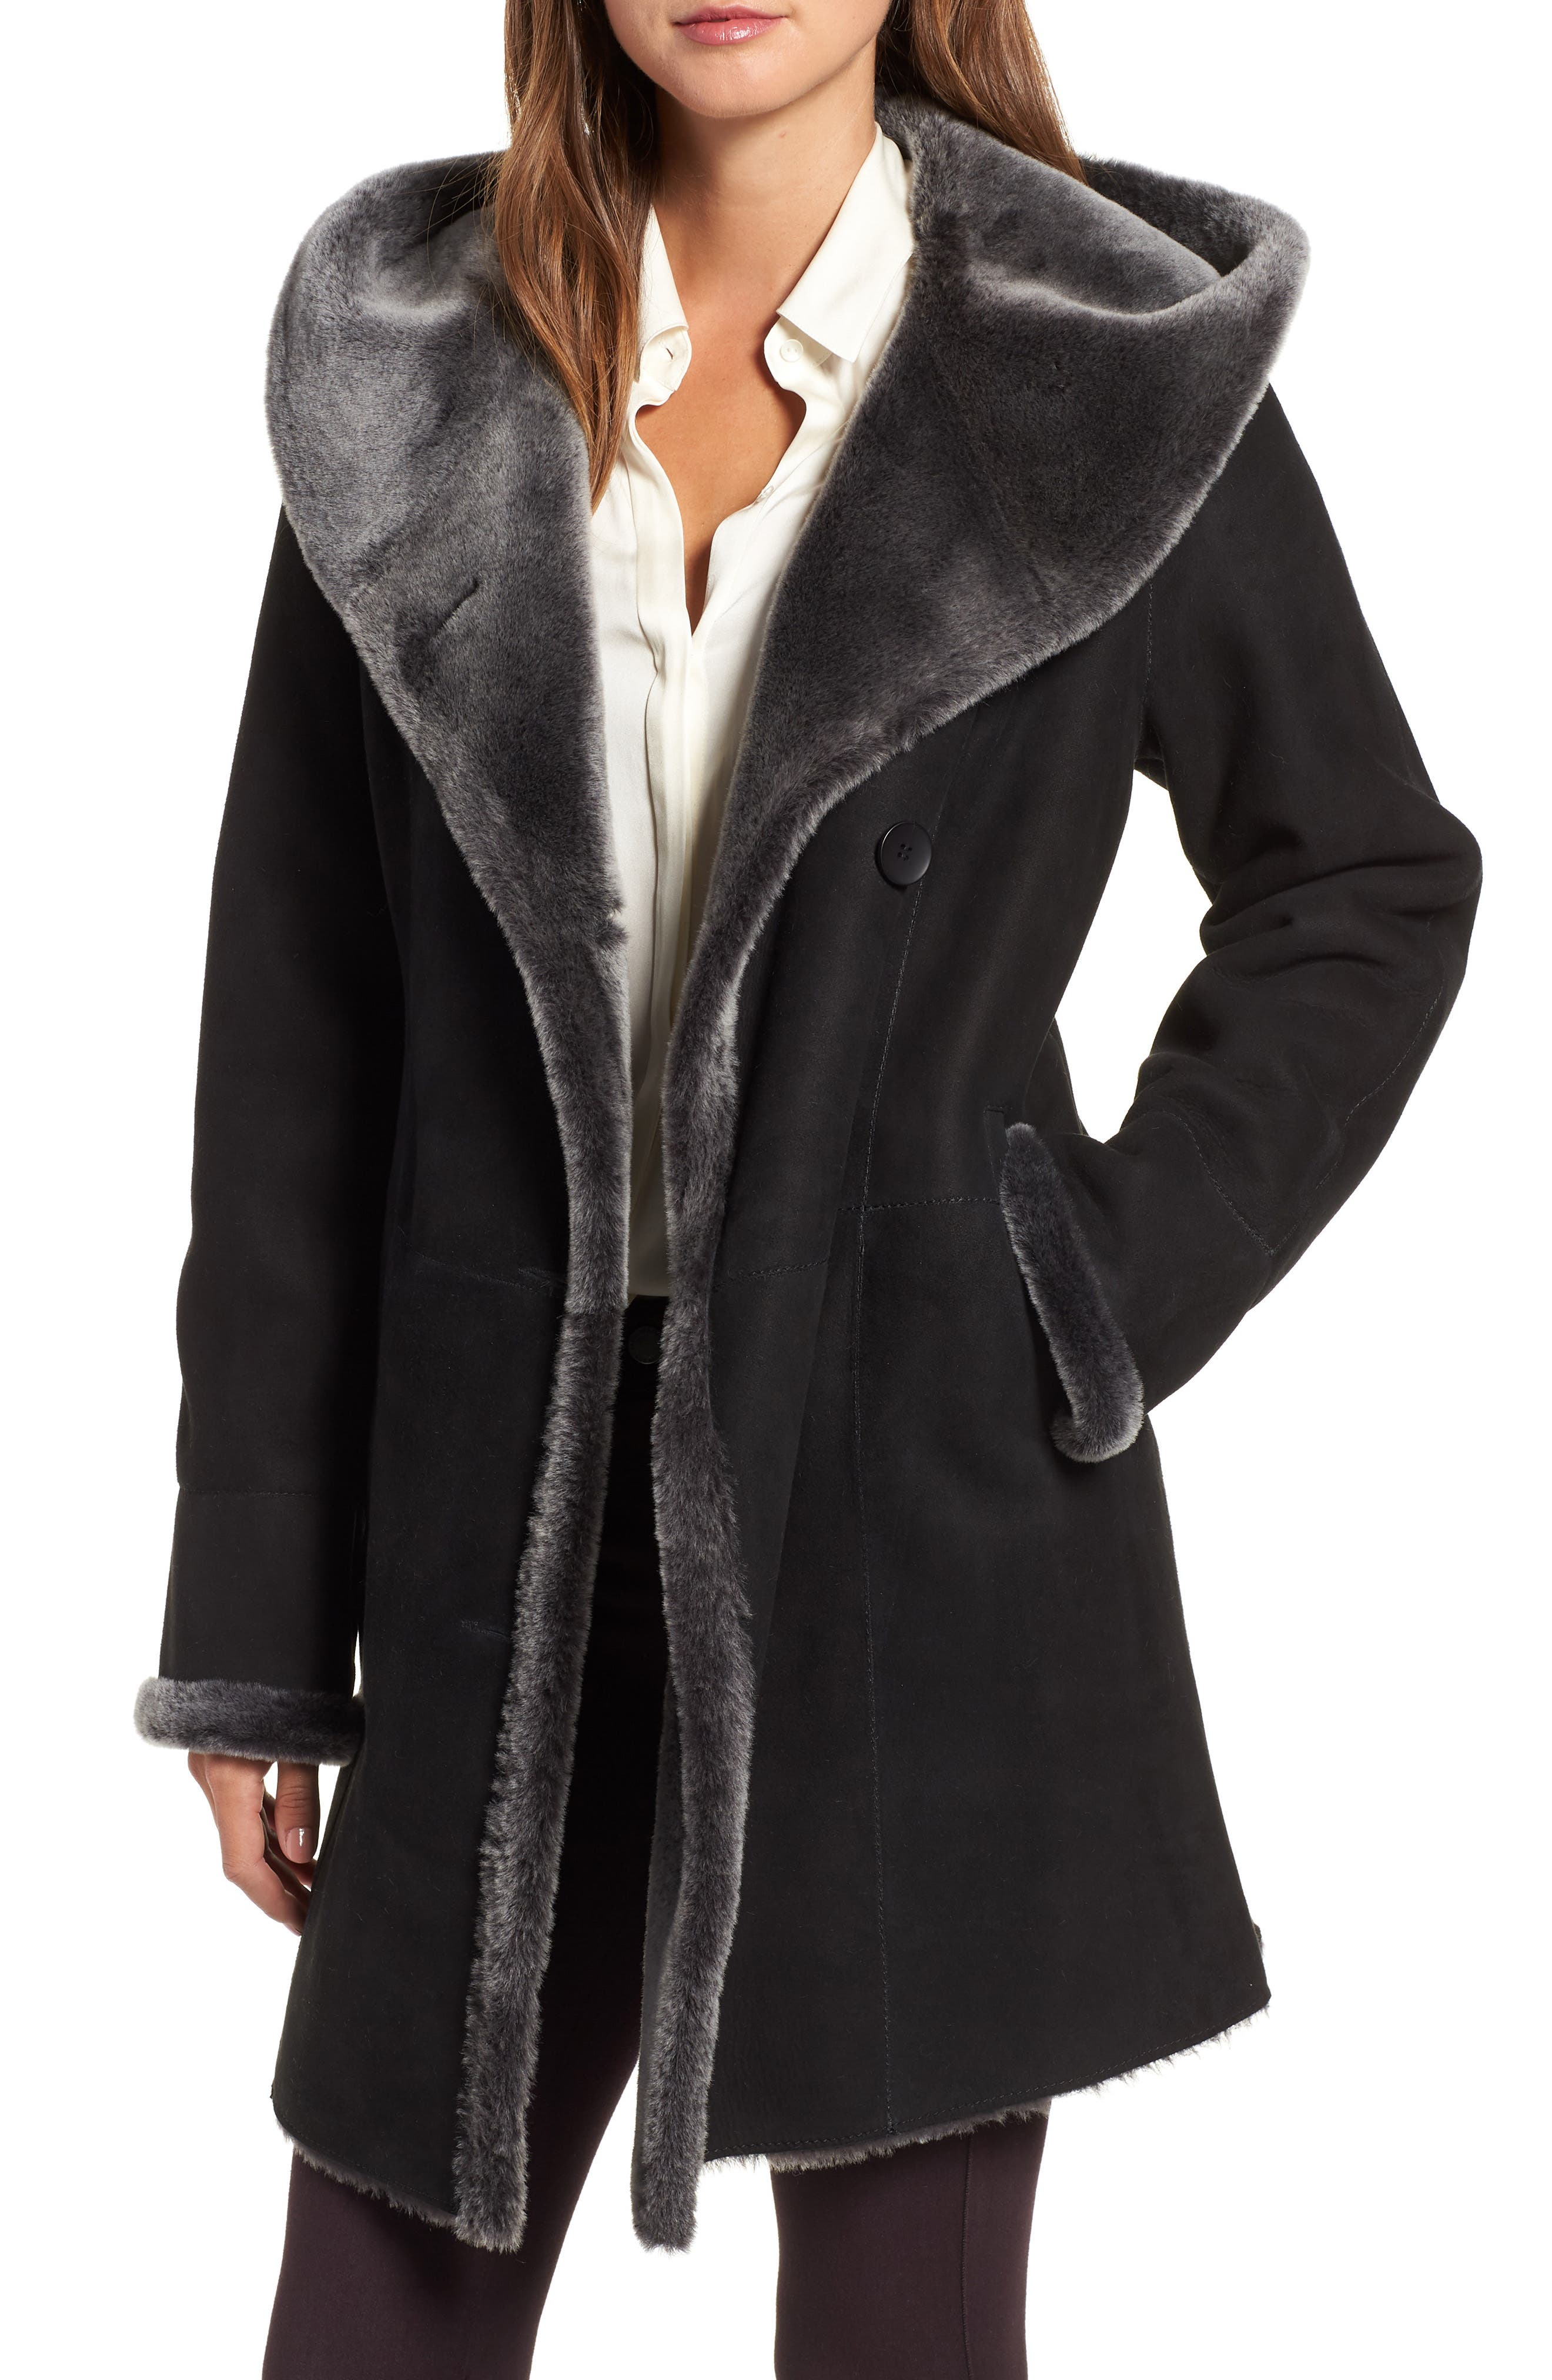 Hiso Hooded Merino Shearling Coat, Black